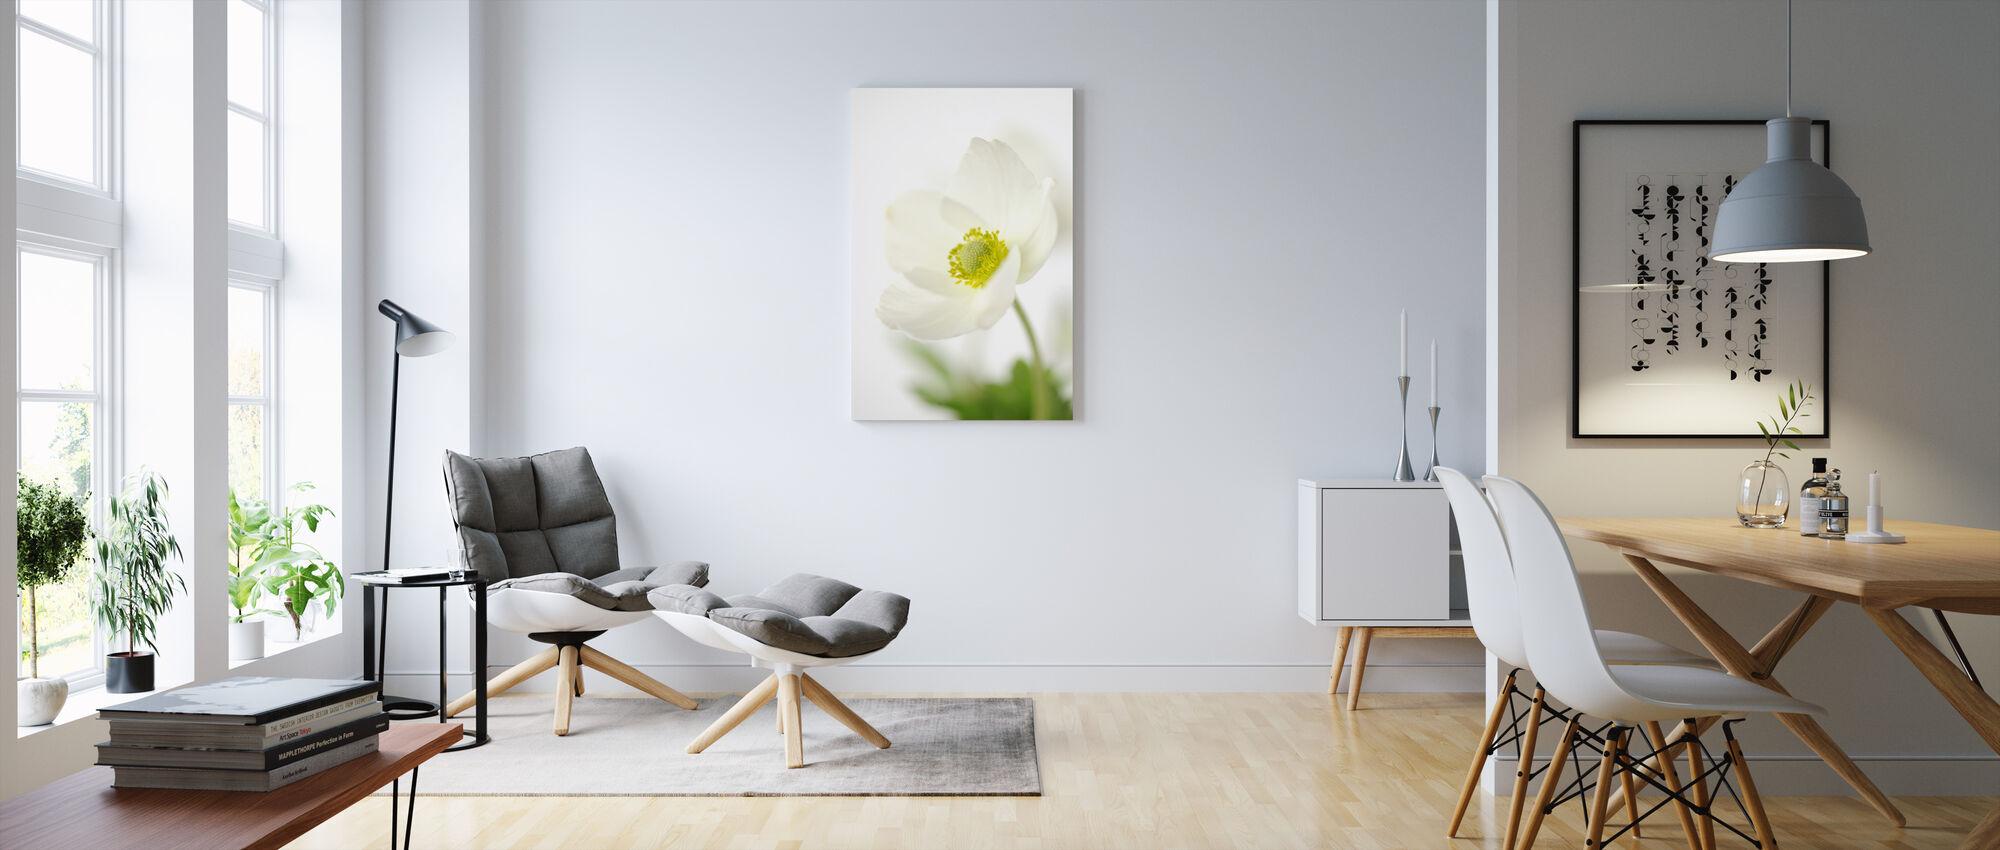 Delicate Flower - Canvas print - Living Room